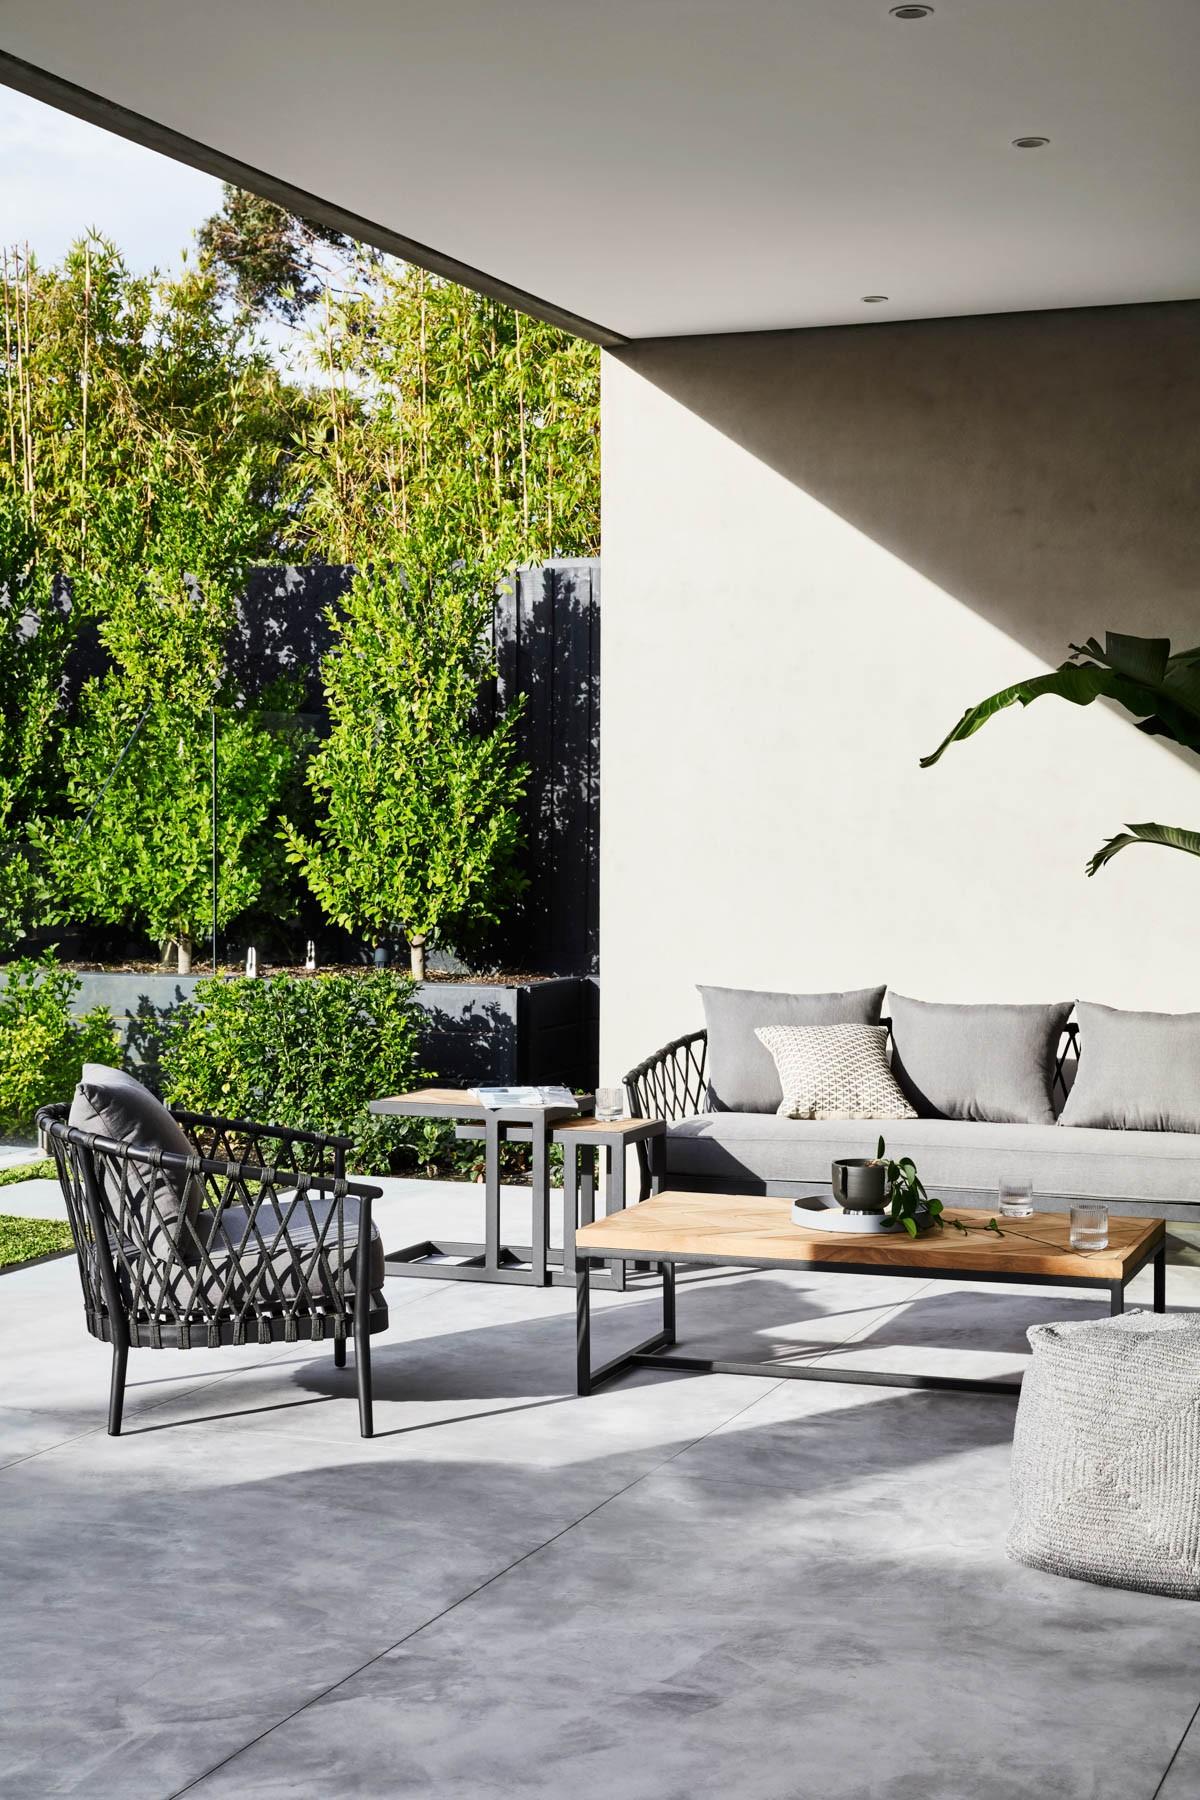 Furniture Gallery Sofas maui-one-seater-sofa-01